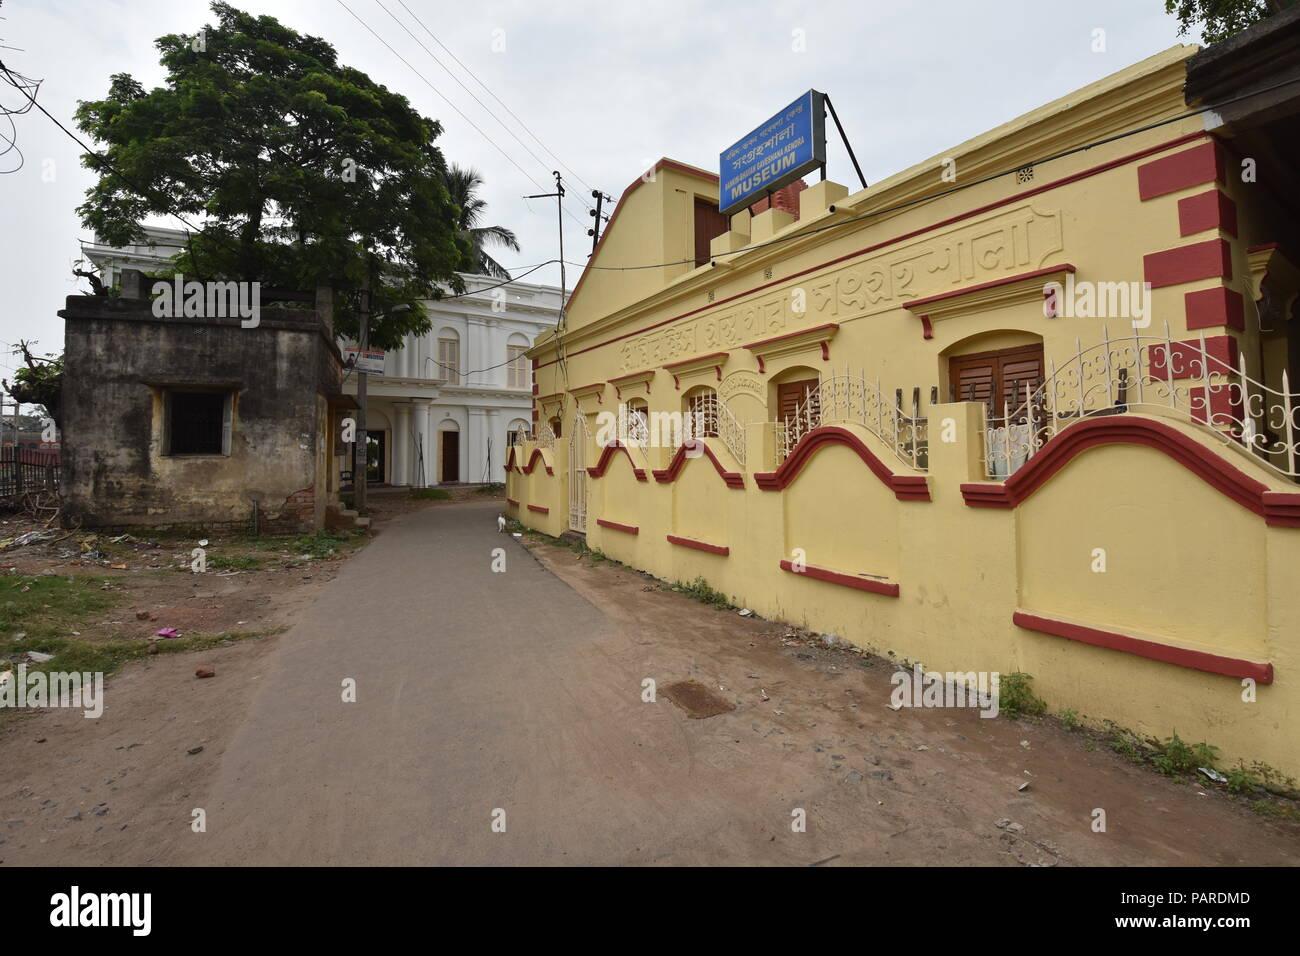 Bankim Bhavan - Library and Museum, Naihati, West Bengal